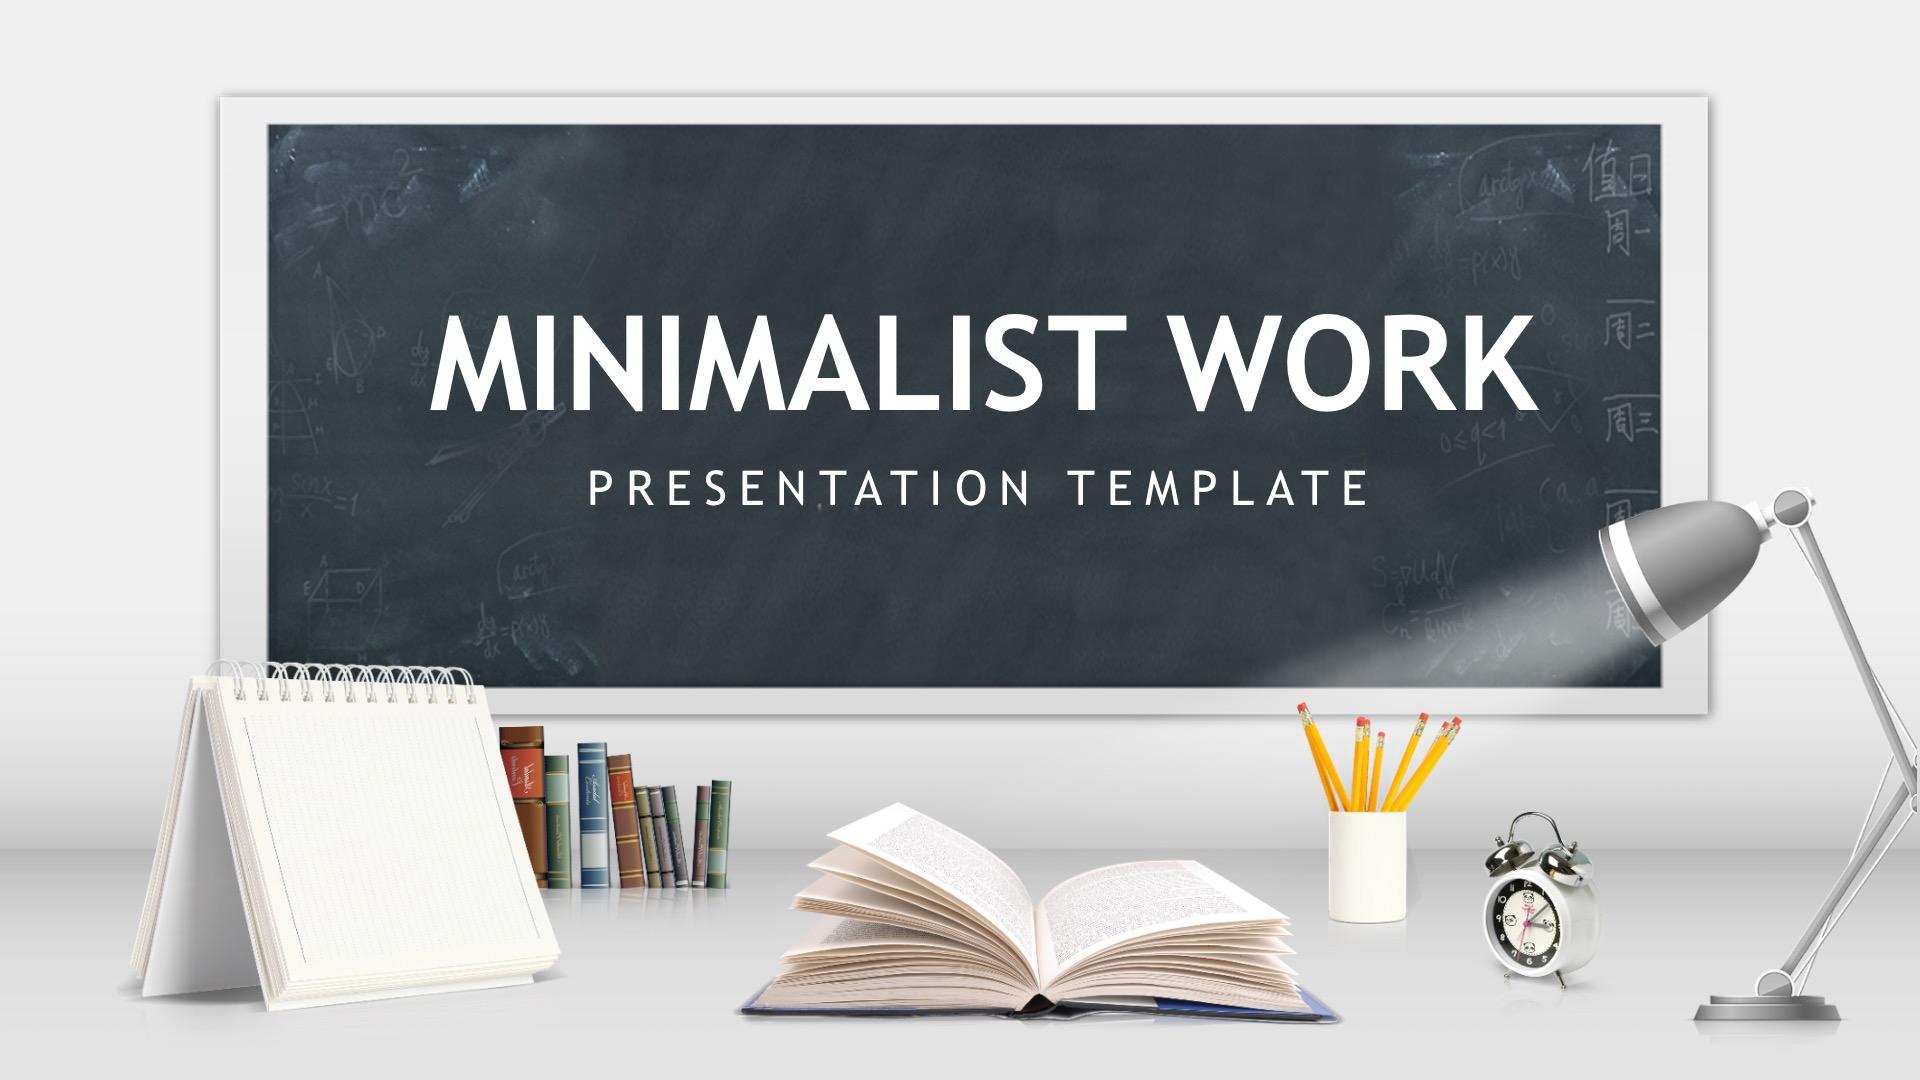 Minimalist Work PPT Backgrounds 1